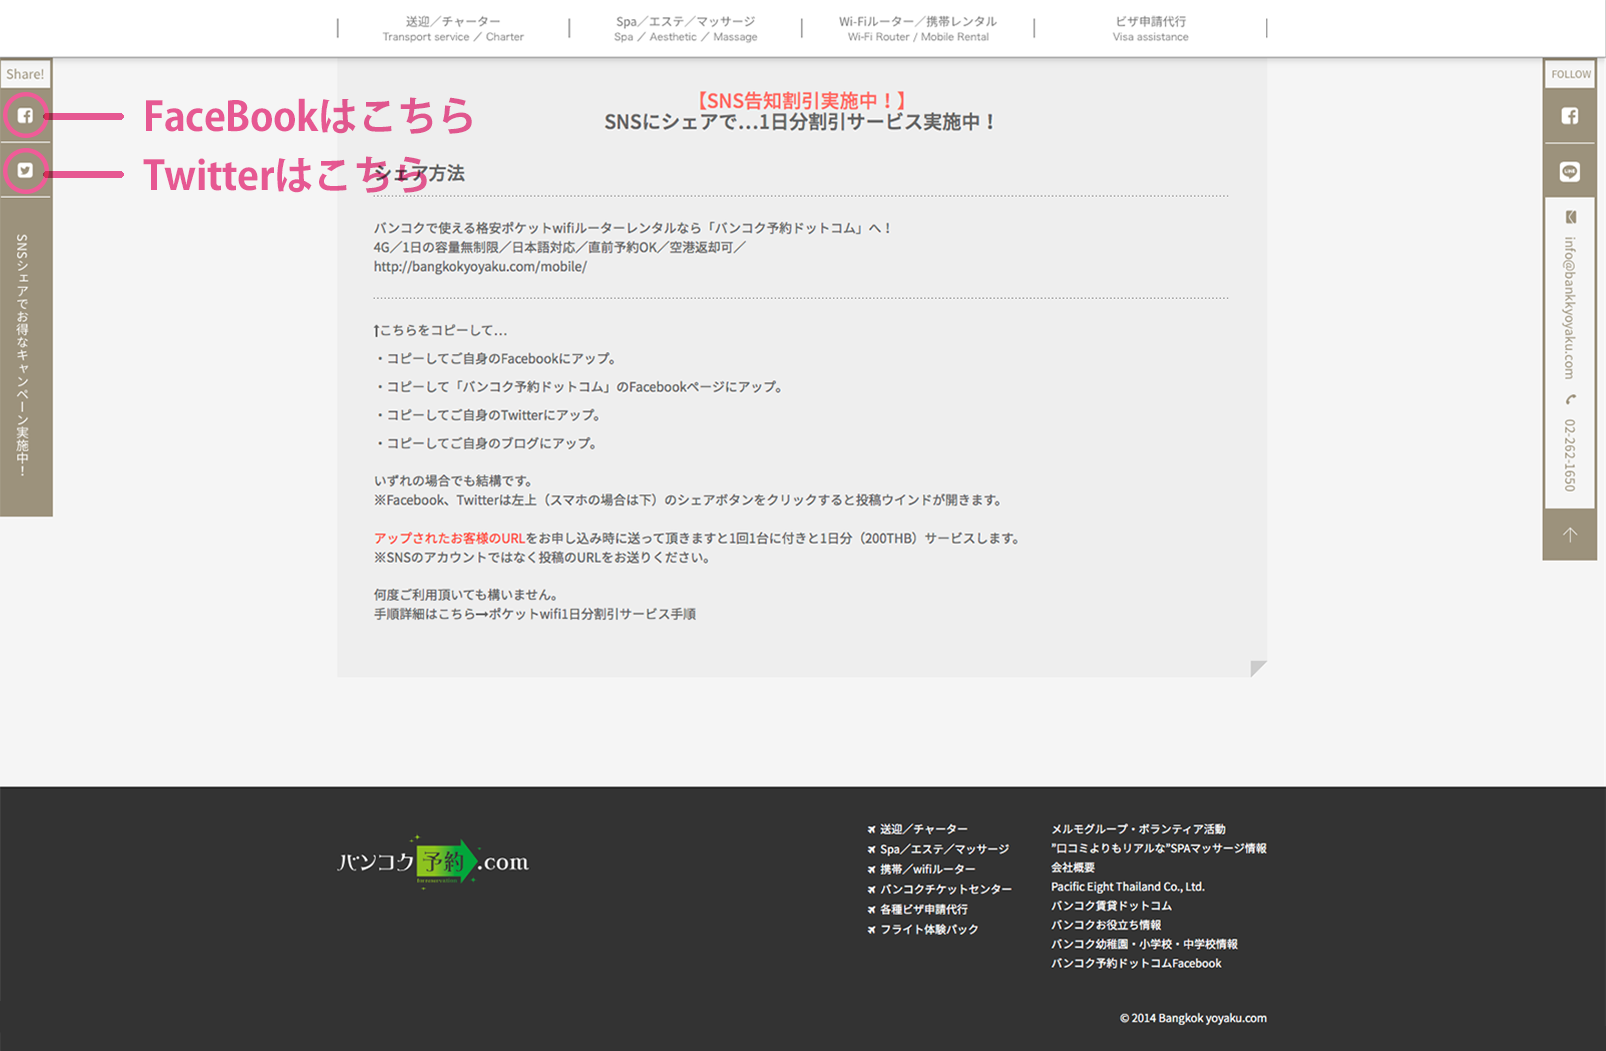 share_step2